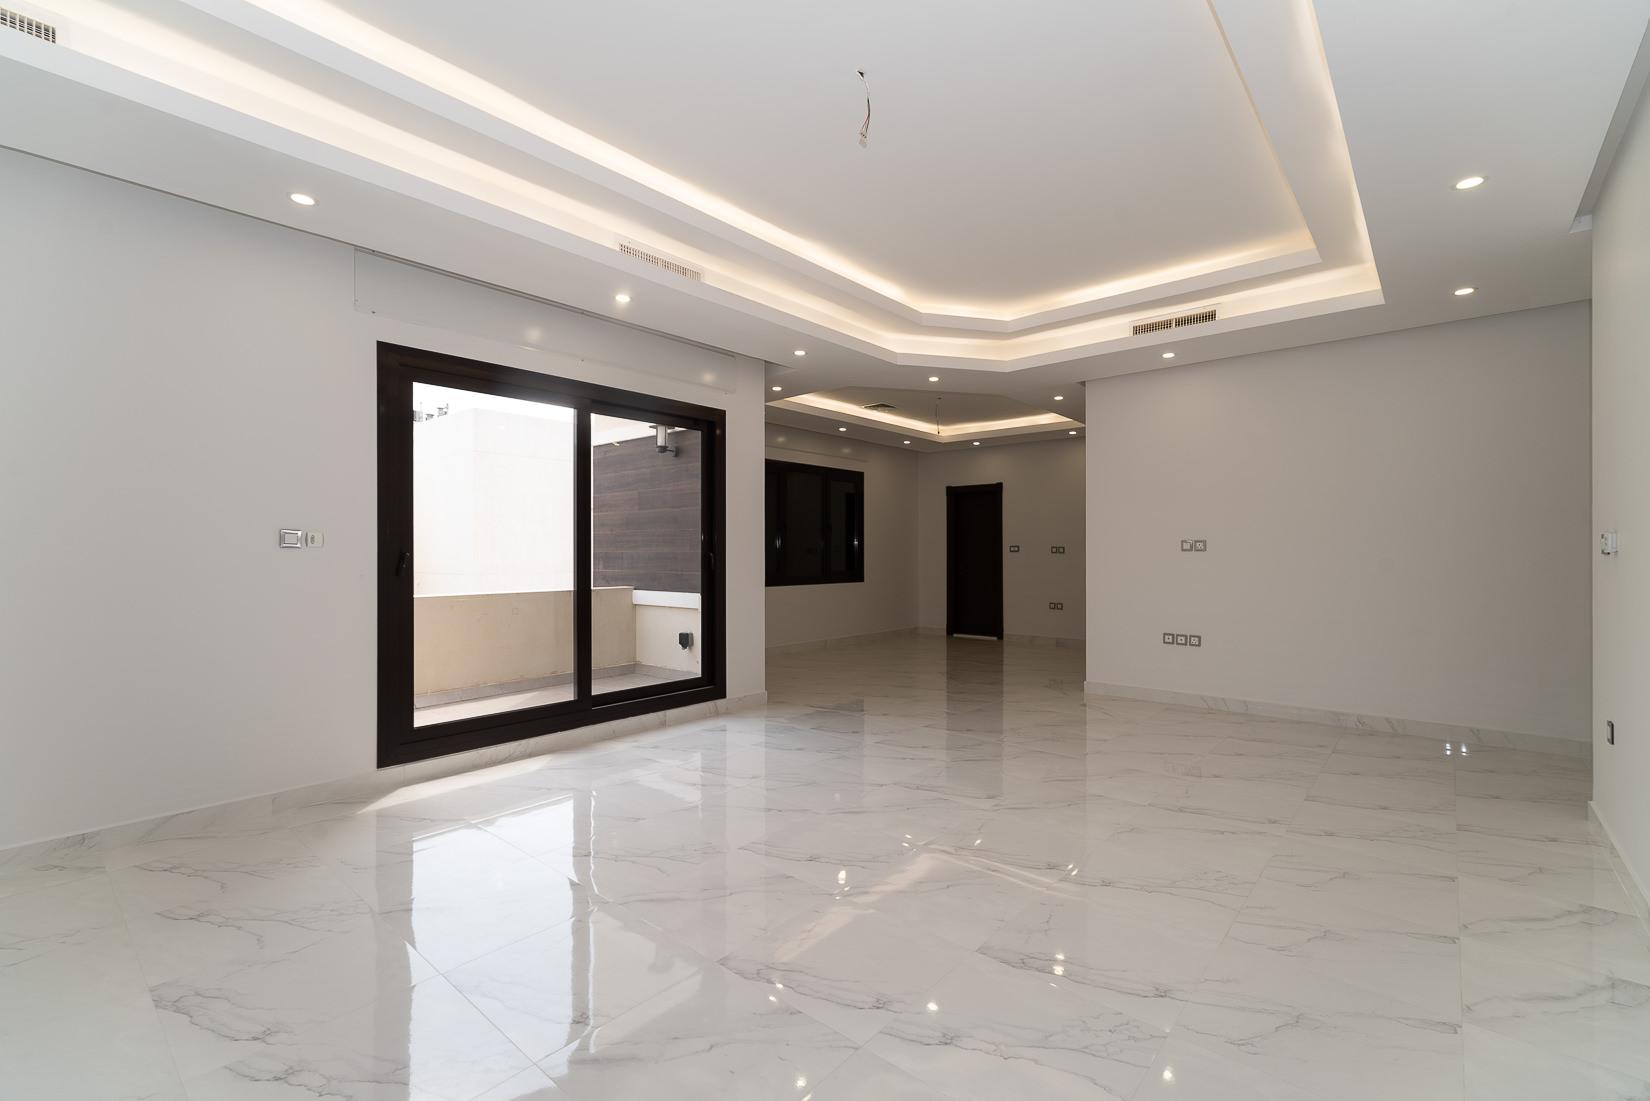 Siddeeq – lovely, new, four bedroom floor w/balcony